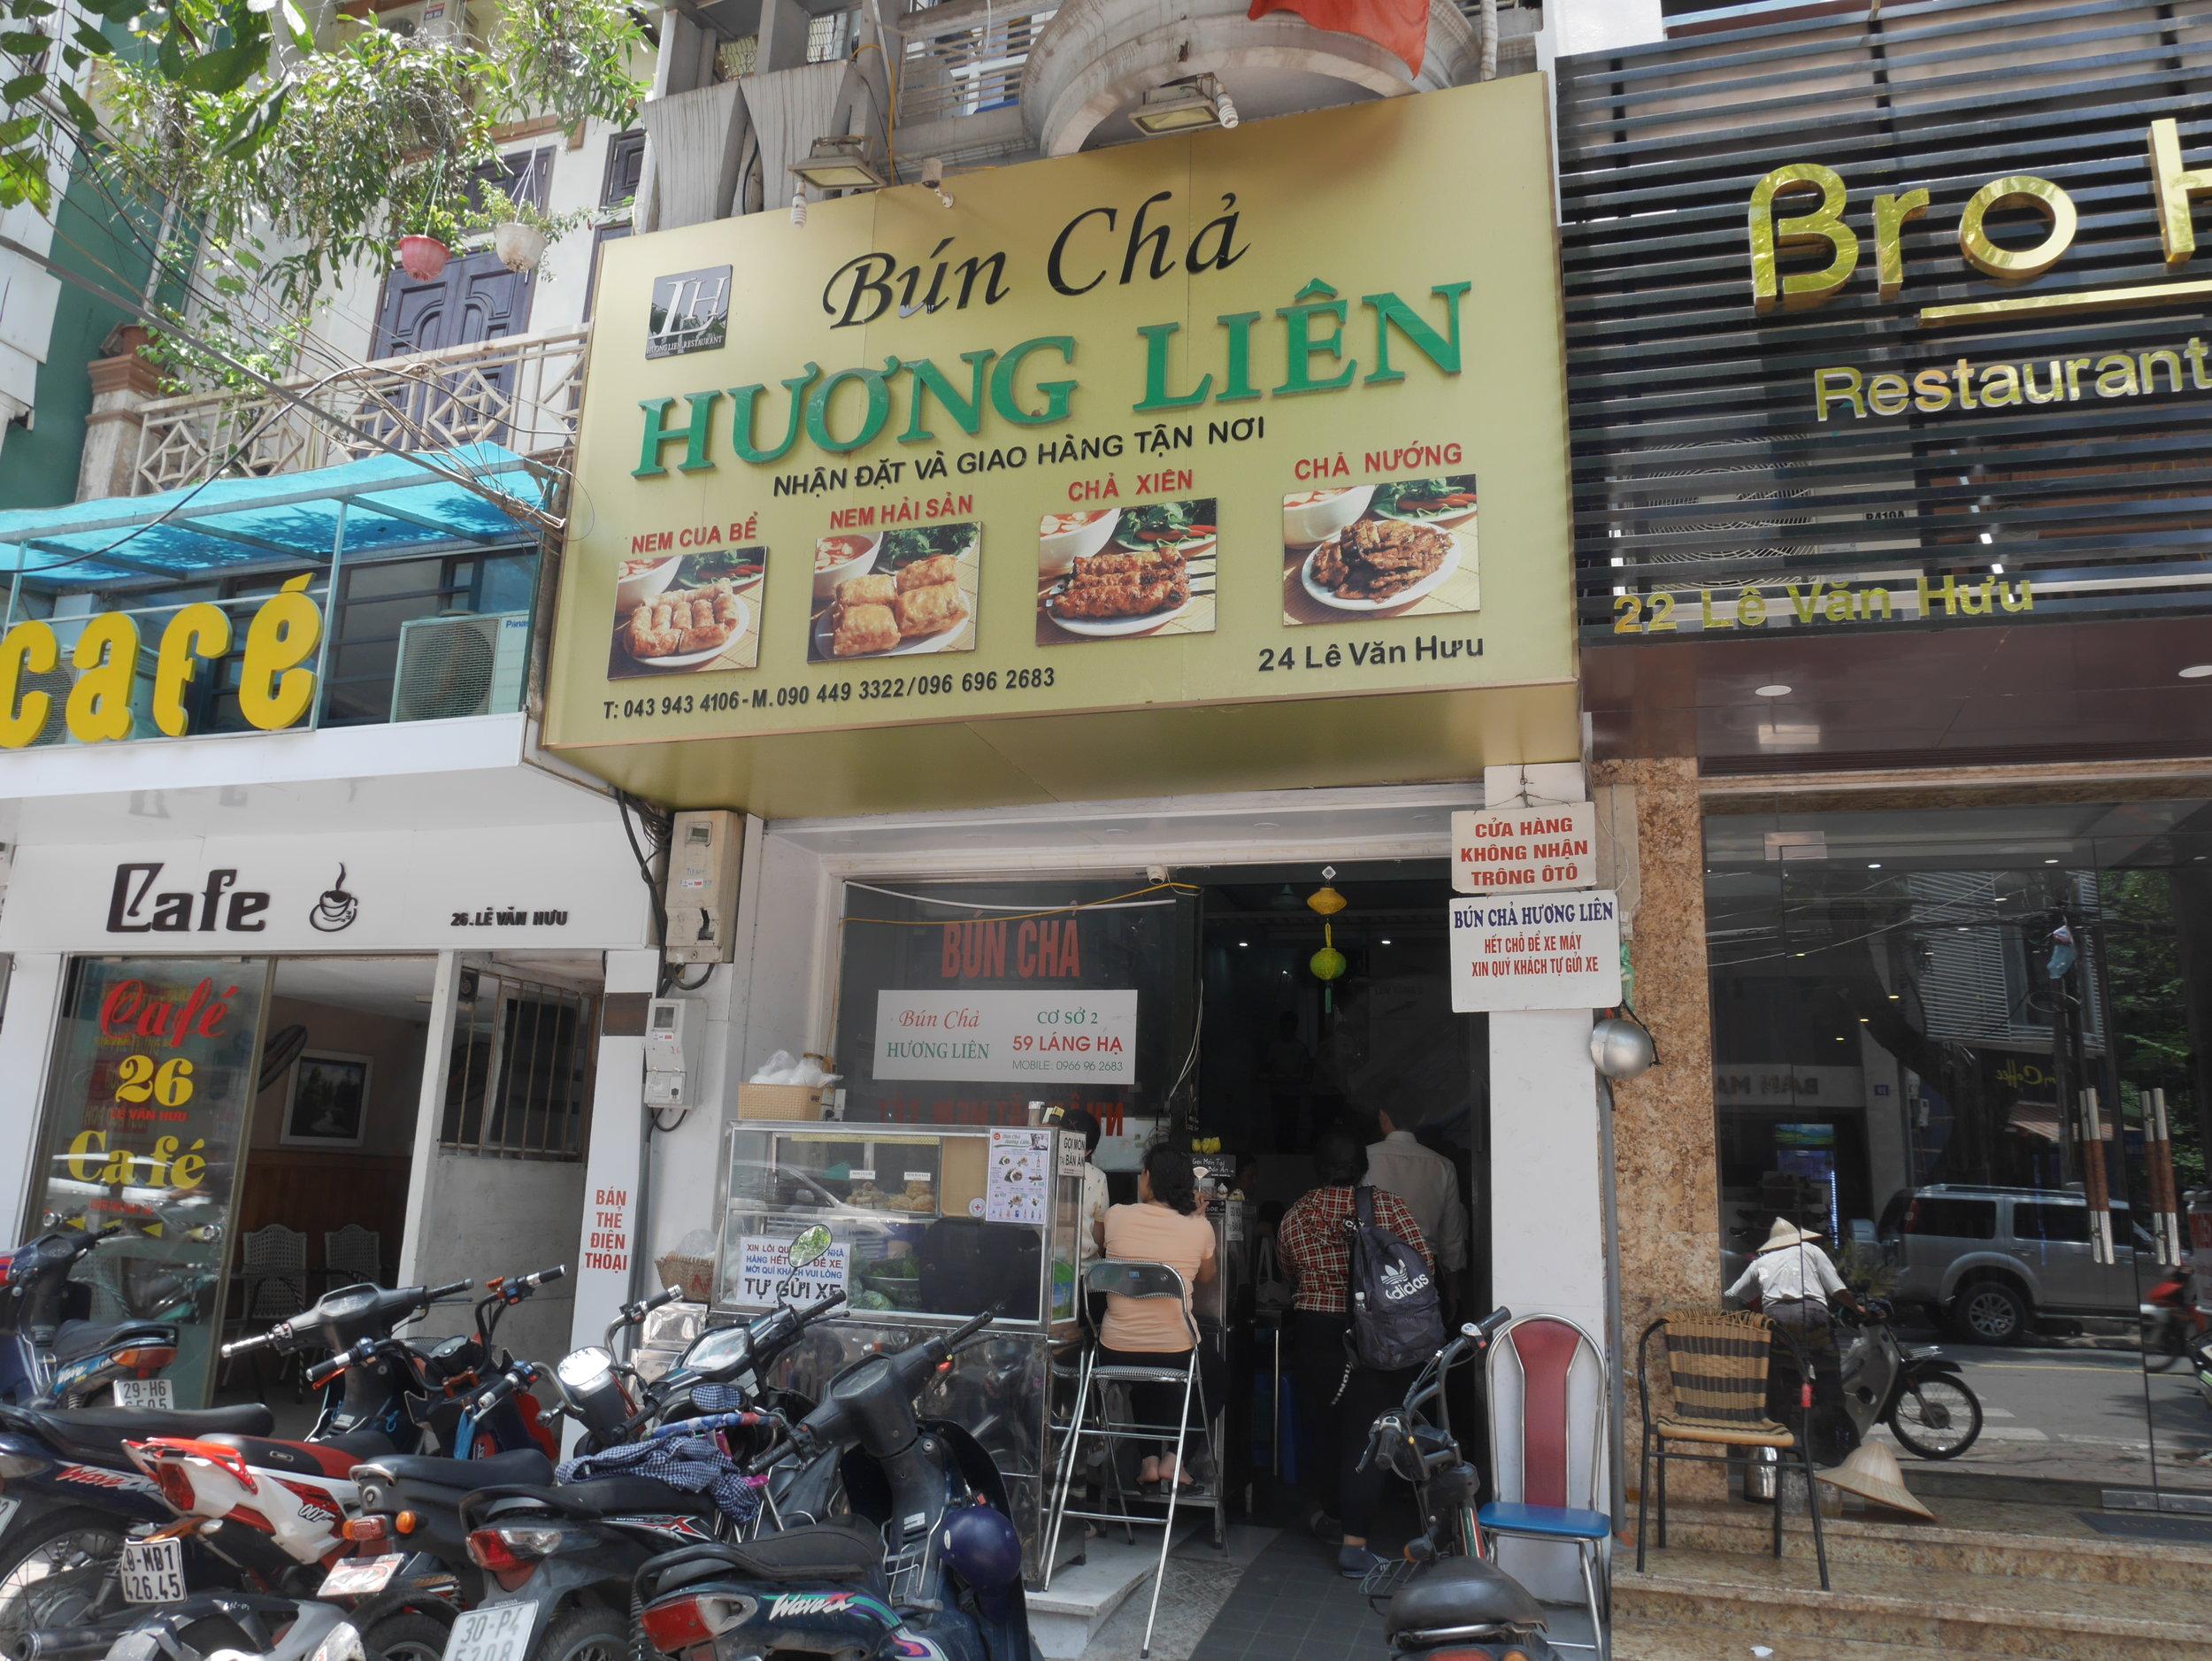 Bún Chả Hương Liên - the shop where Obama ate in Hanoi, Vietnam